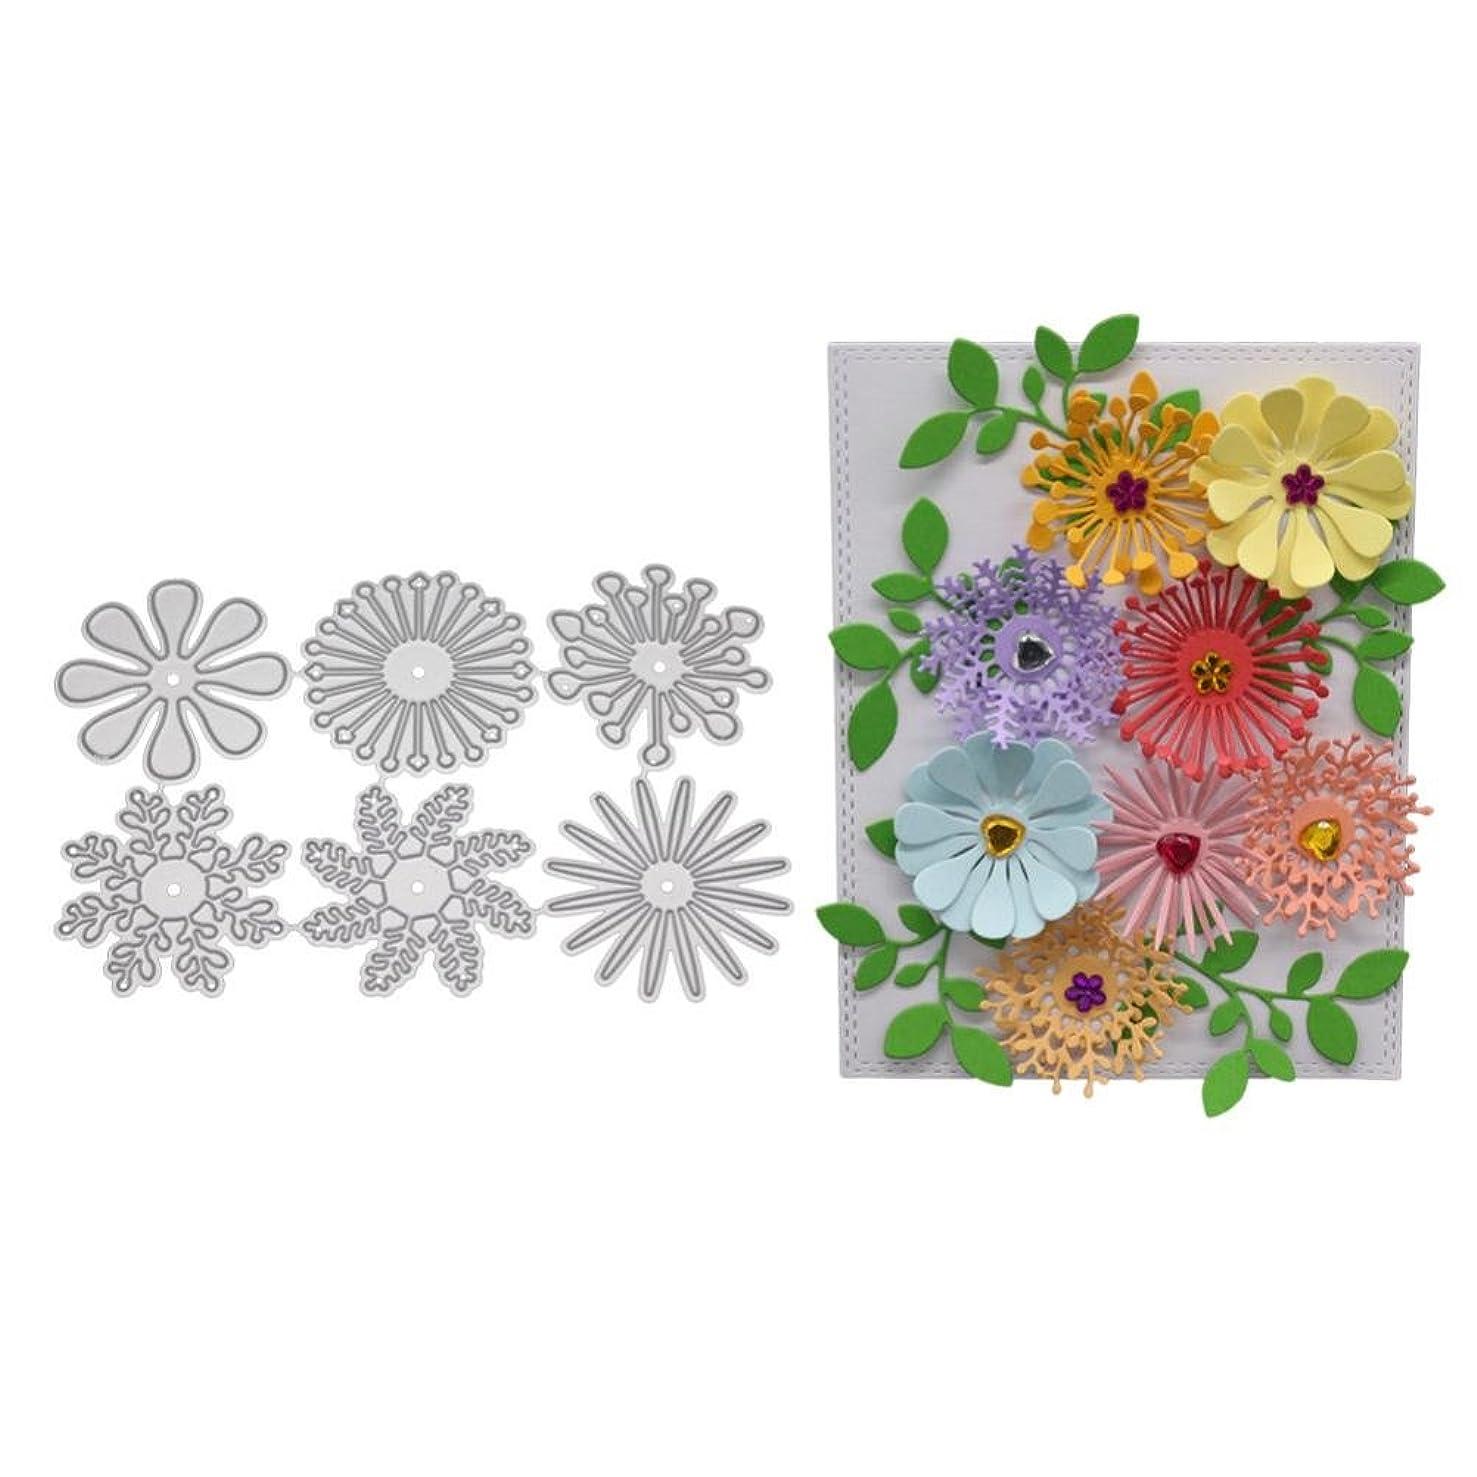 ANBOO Cutting Dies, Flower Heart Metal Cutting Dies Stencil Cutting for Making Scrapbooking Cut Flower Metal Die Cuts for Card Making (F)